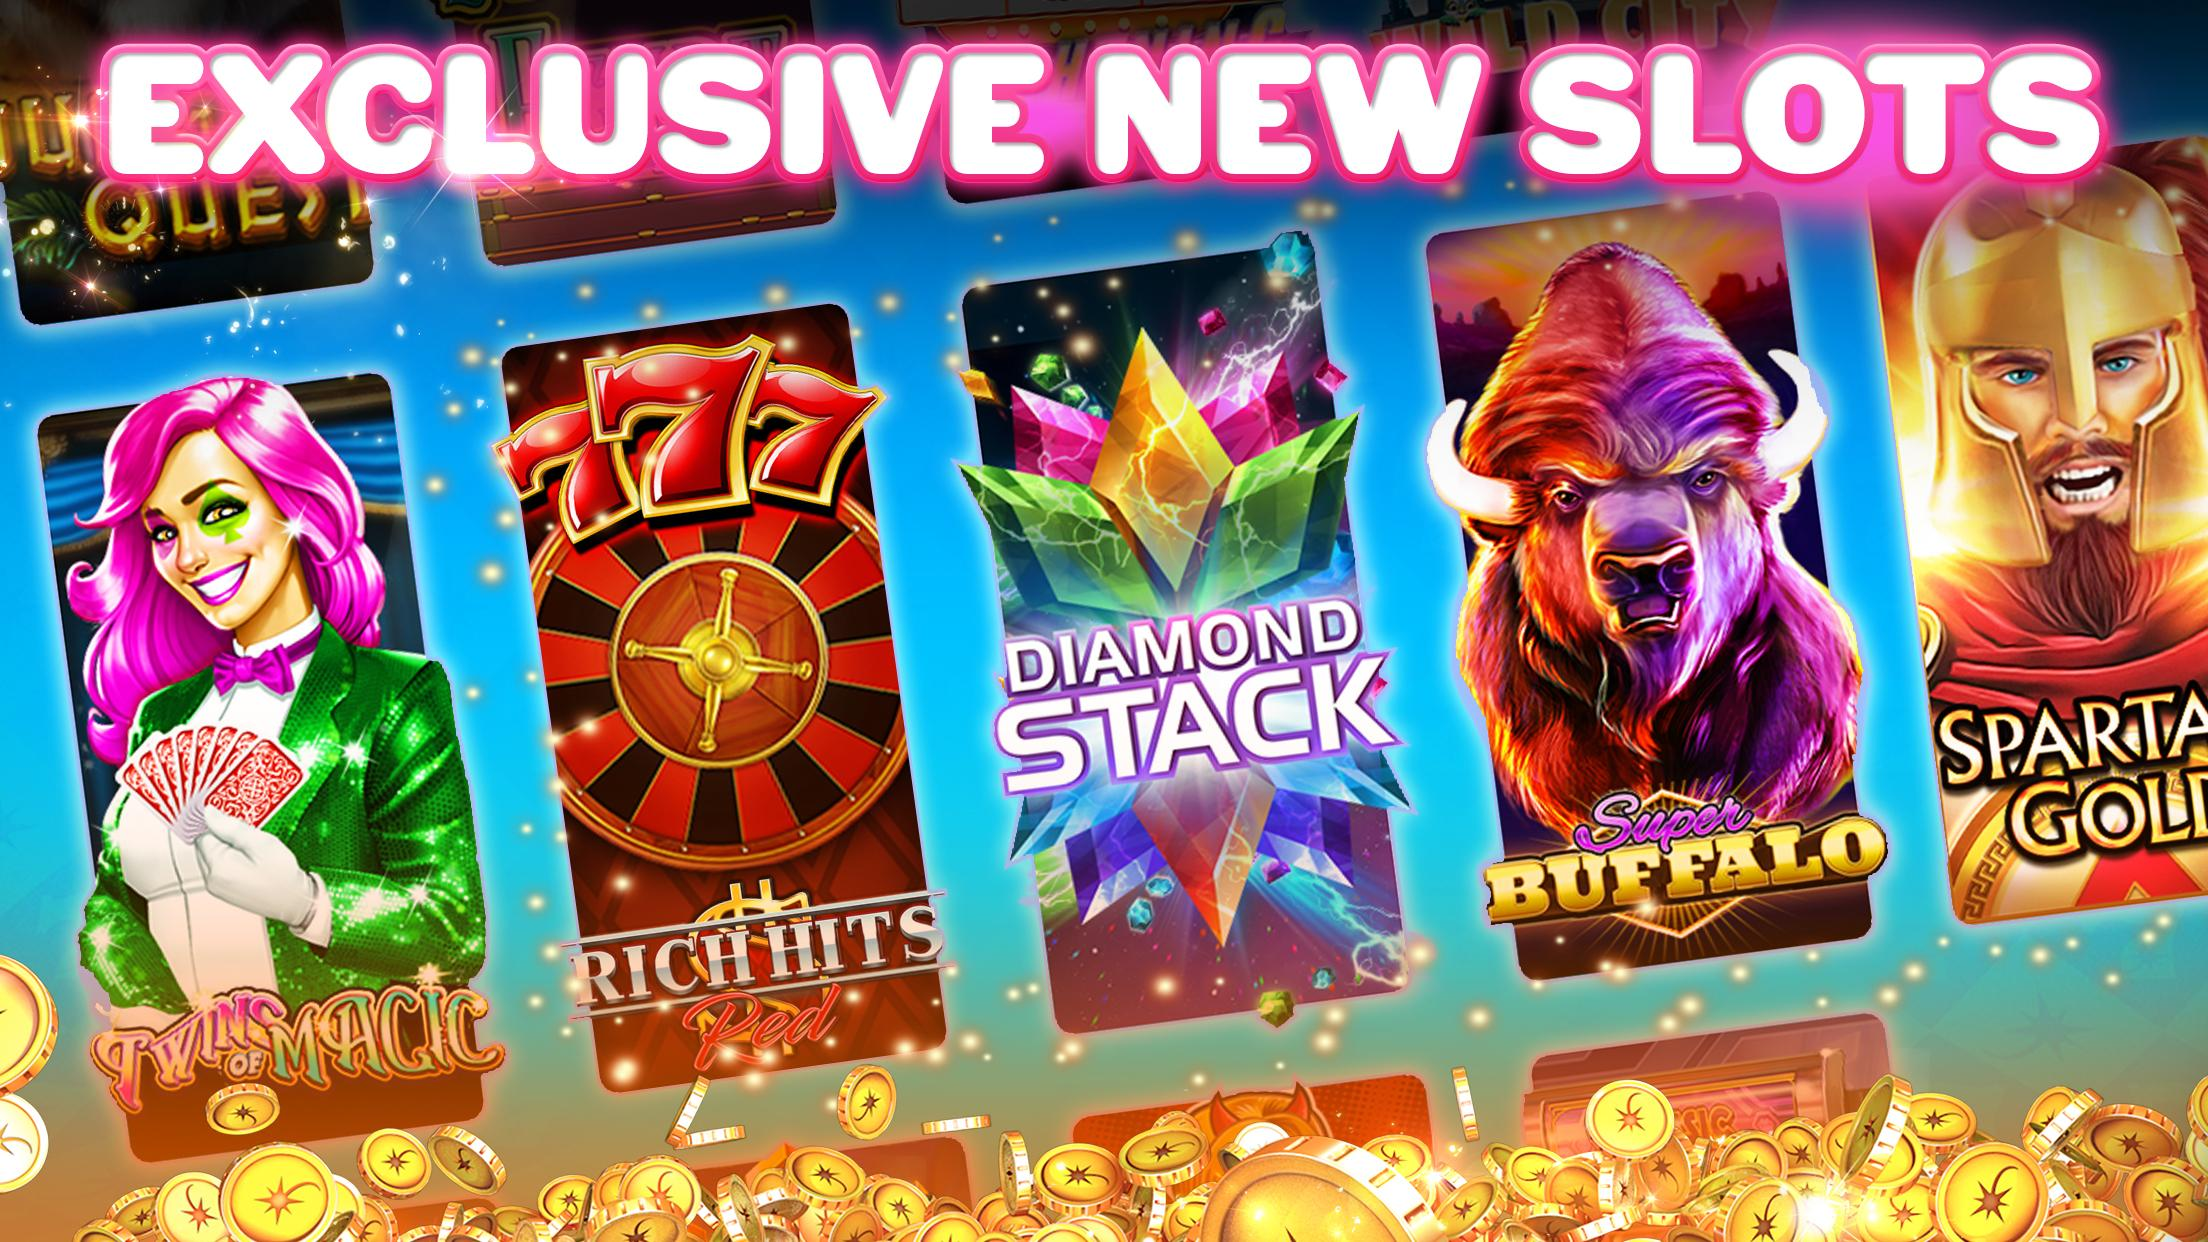 Jackpotjoy Slots Slot machines with Bonus Games 26.0.05 Screenshot 21